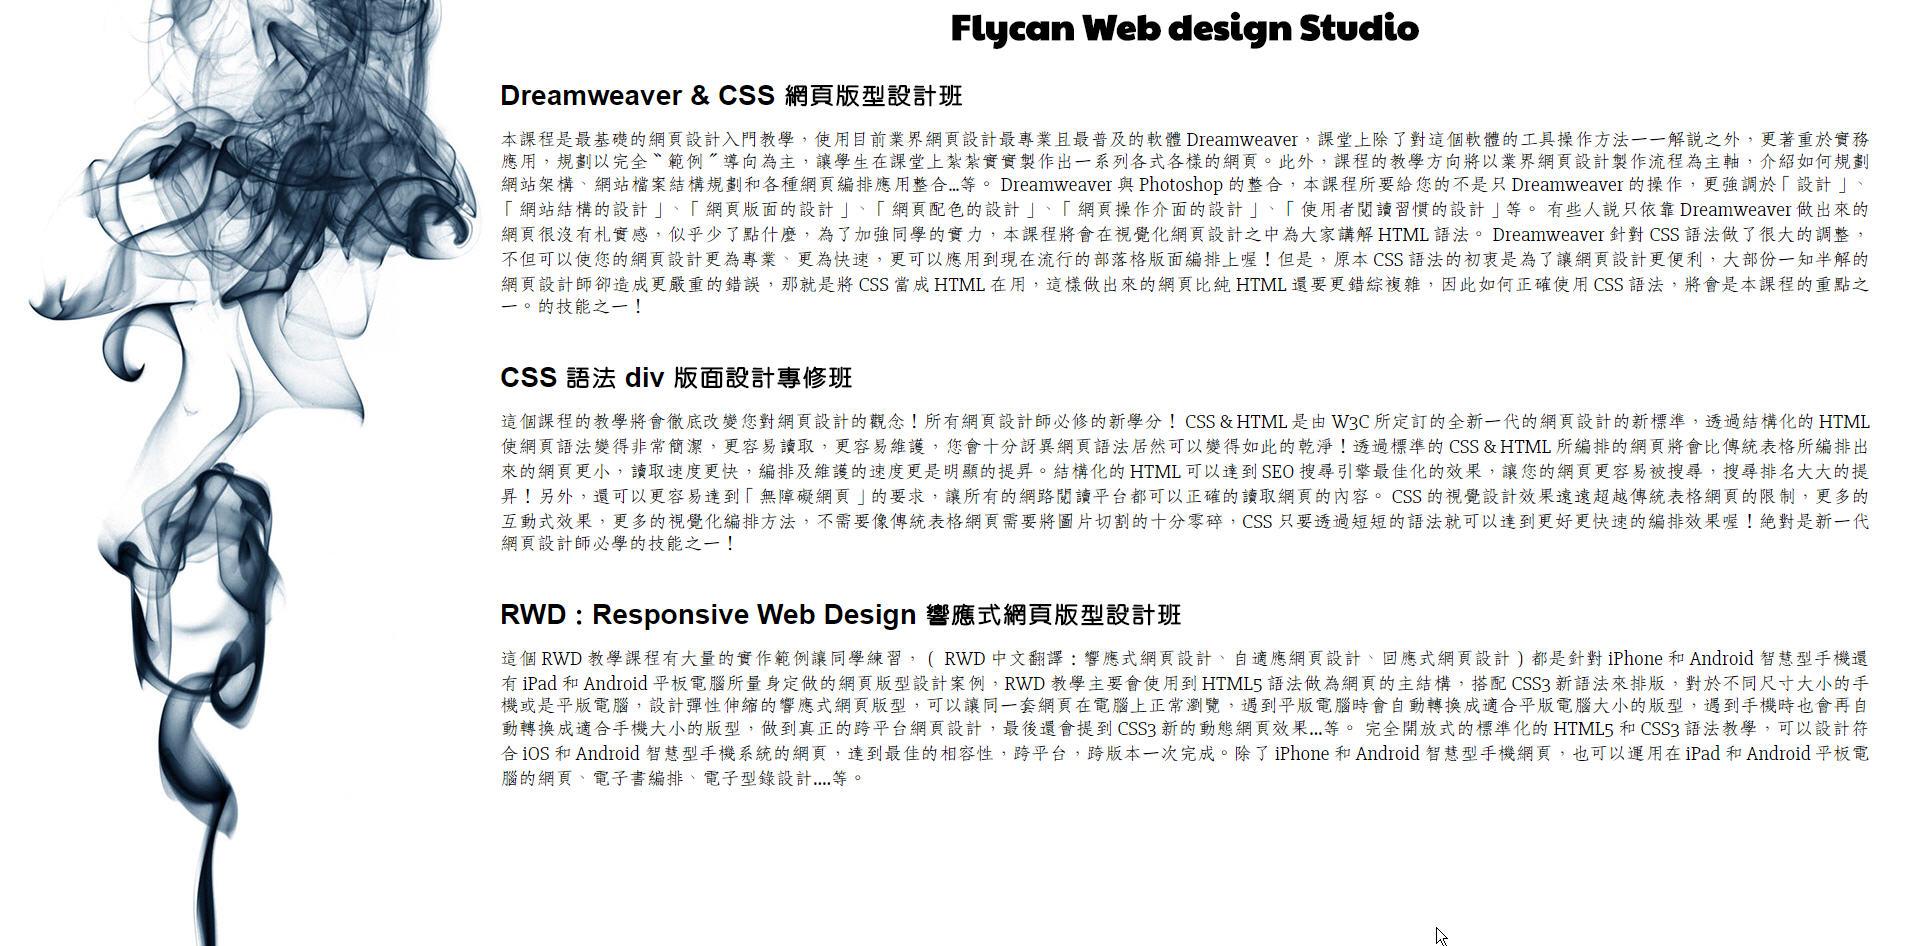 CSS 語法 - 網頁設計 Free Resource 好康報報 Good Design 好站報報  - 【設計資源】 - Google Fonts 免費雲端字庫-實作篇 - okok-1